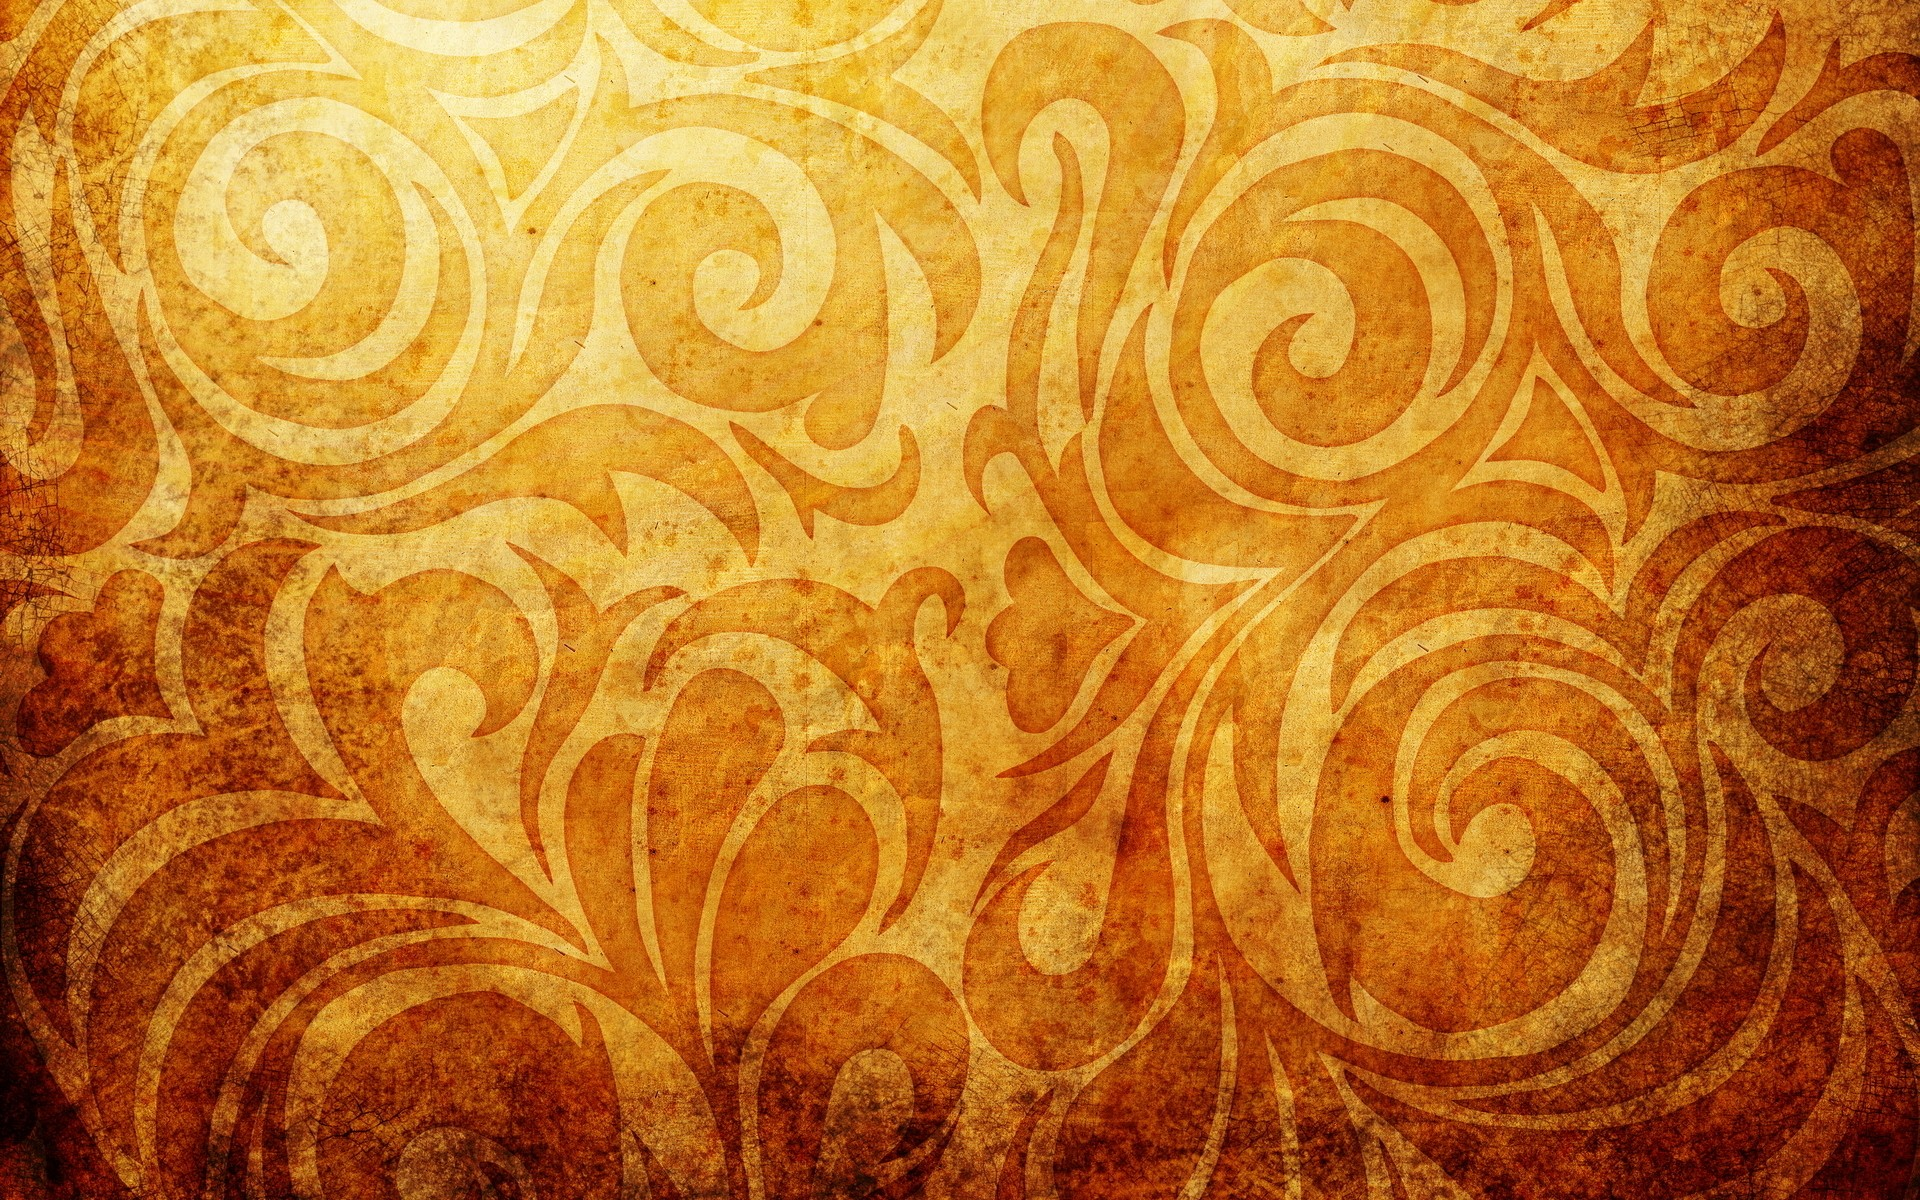 Vintage Patterns Wallpaper 1920x1200 Vintage Patterns Textures 1920x1200